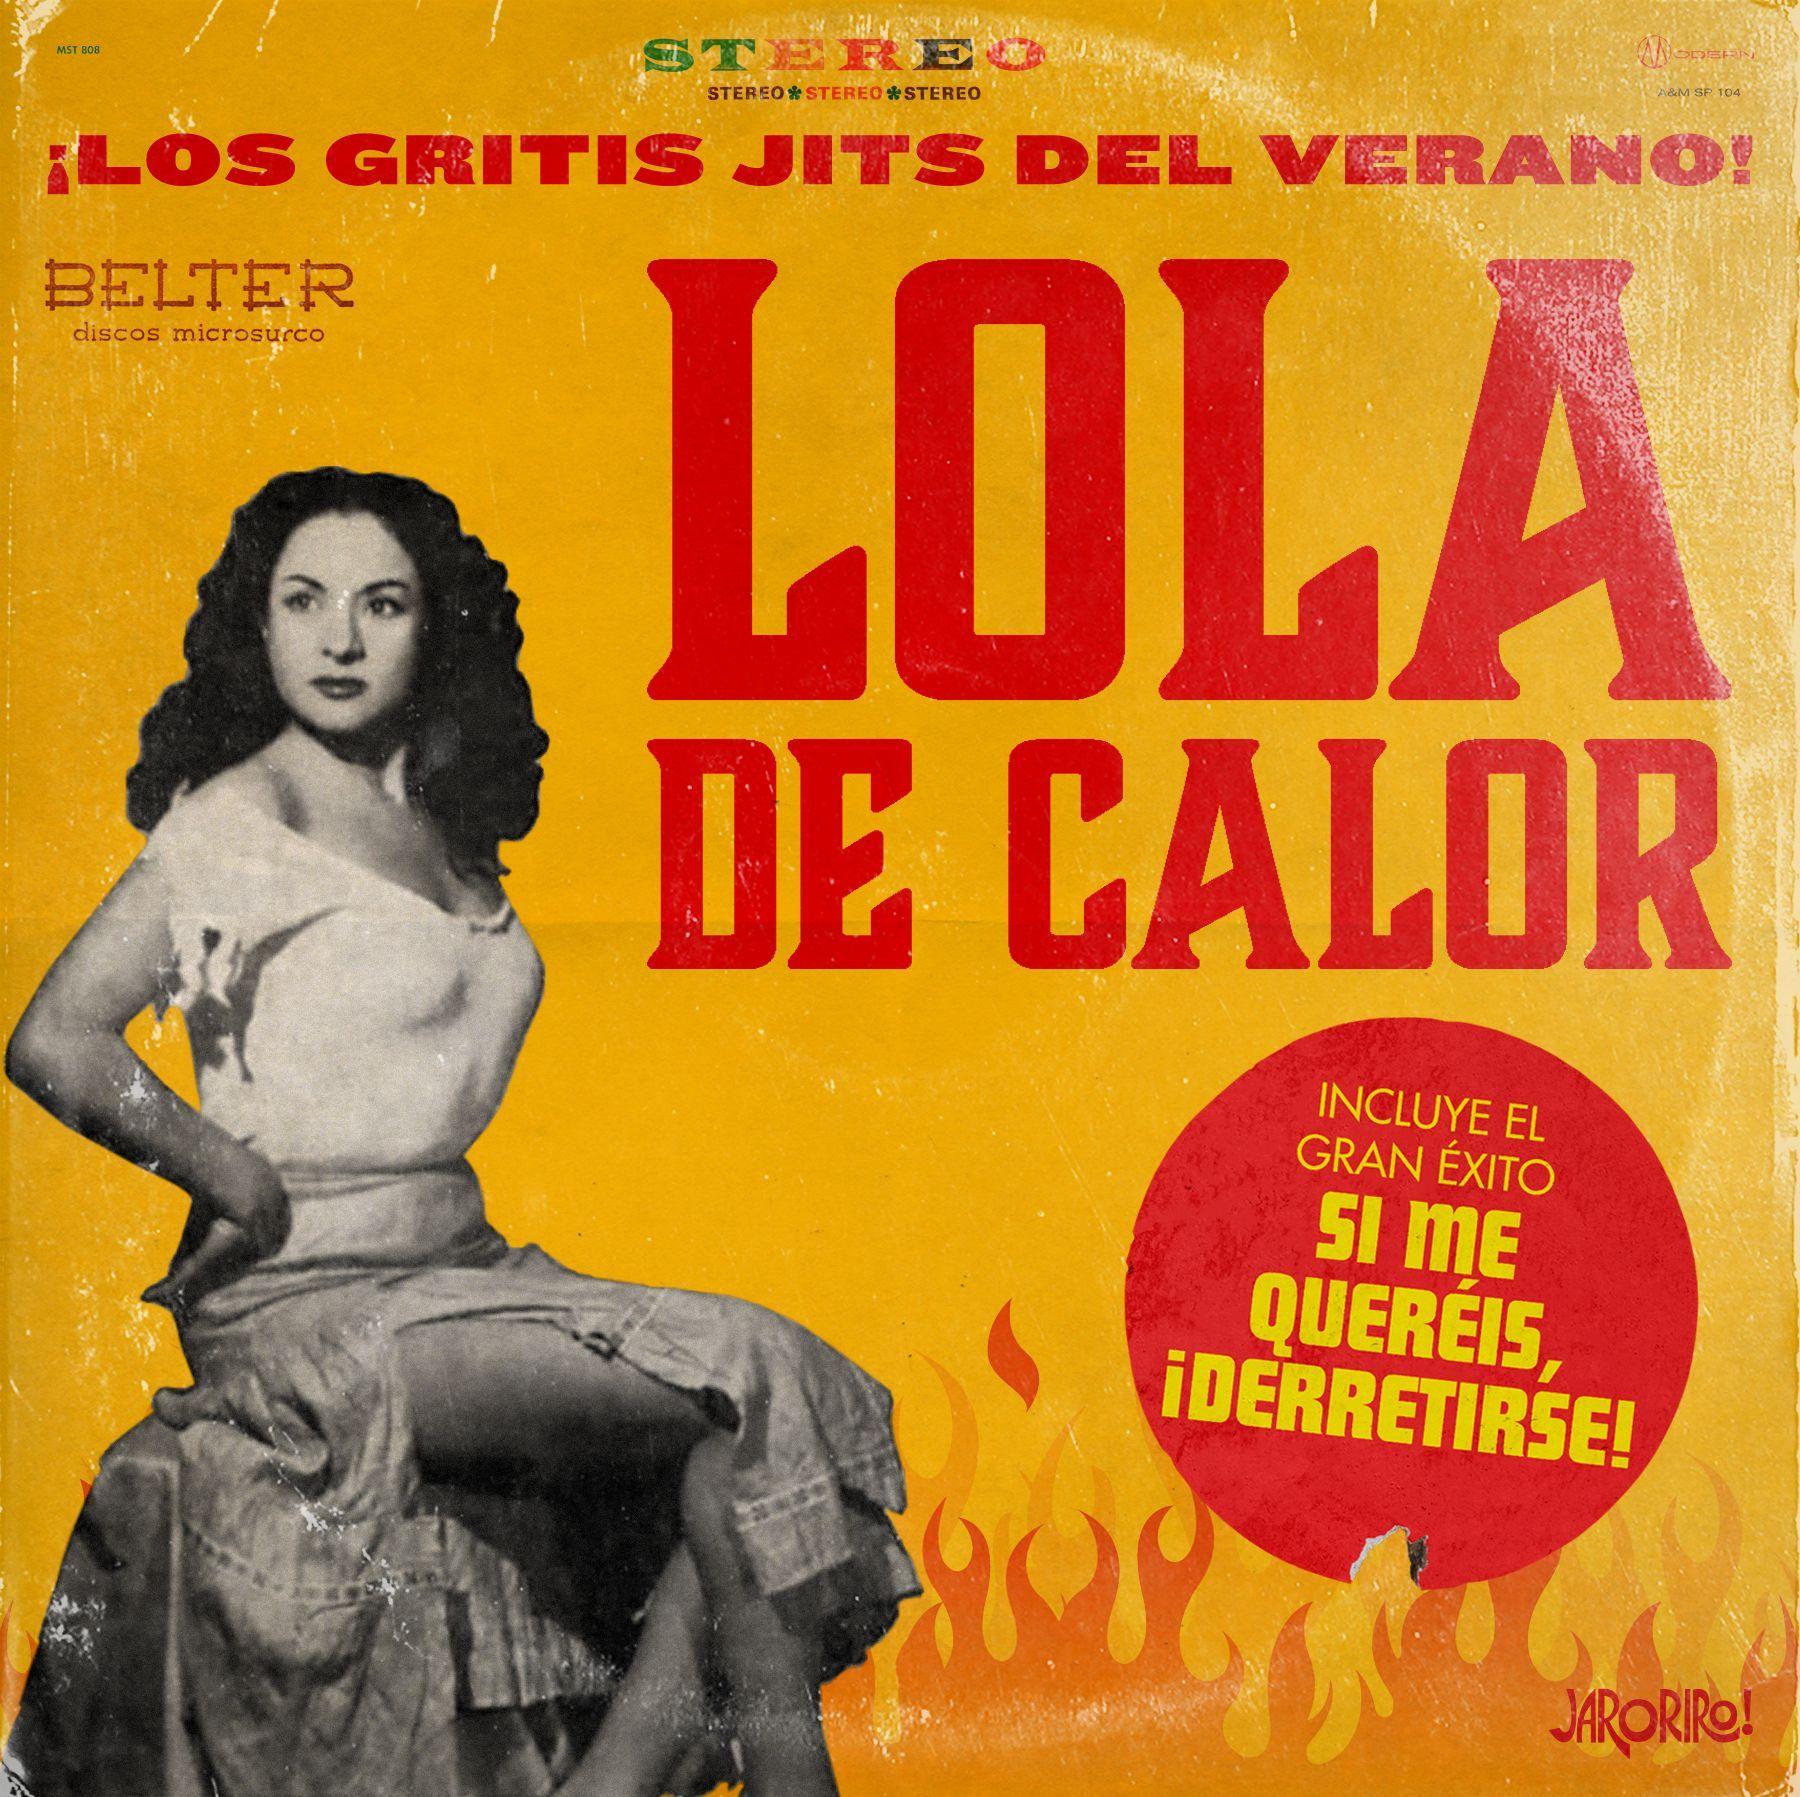 Lola de calor